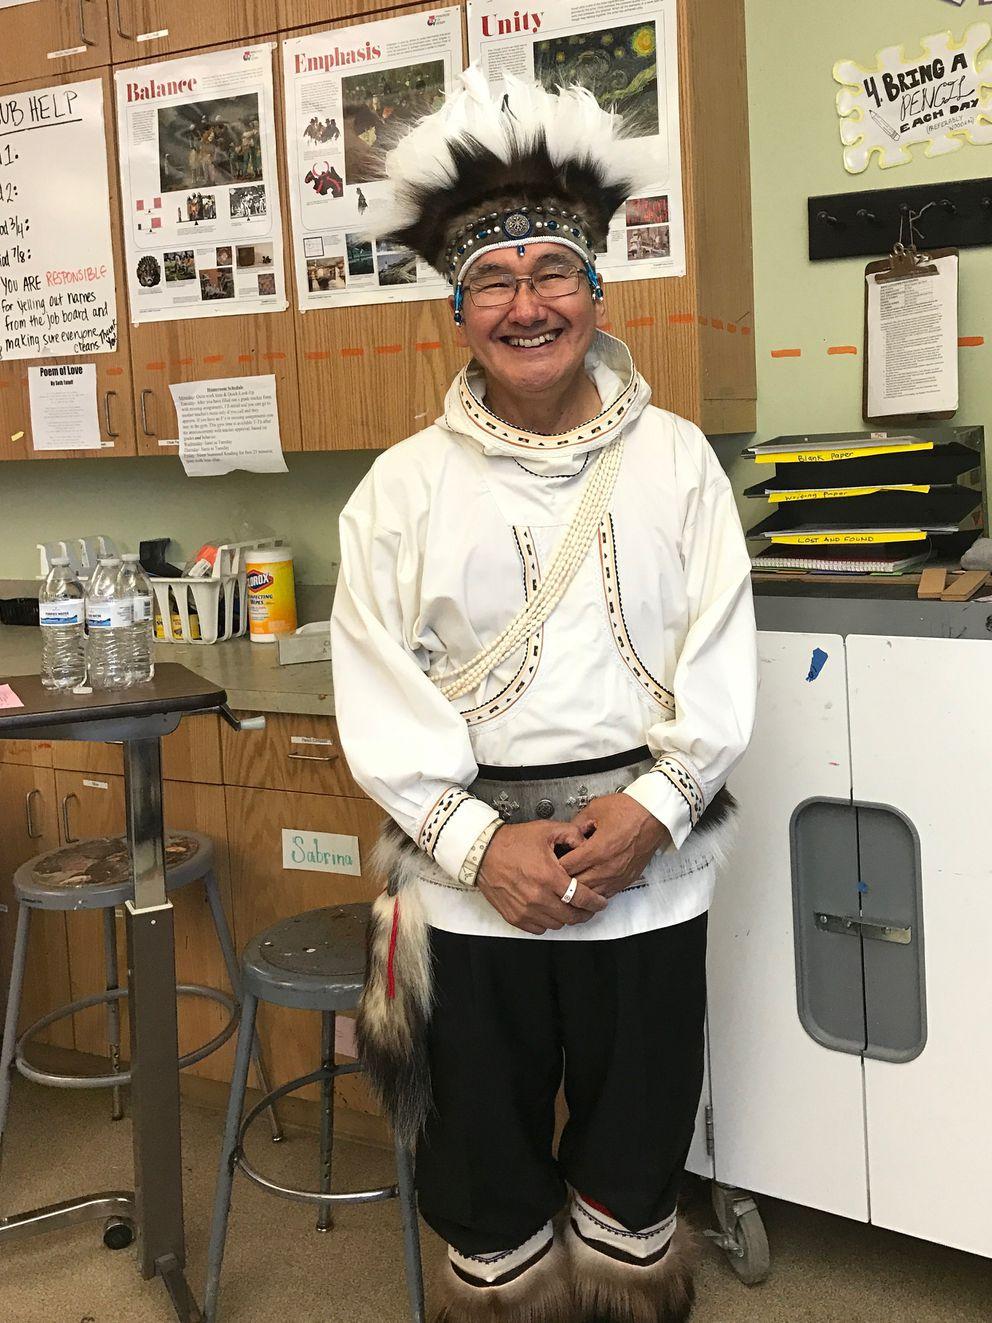 Chuna McIntyre, a Yup'ik cultural ambassador, is seen on Saturday, April 1, 2017, during his workshop on Yup'ik regalia, at Cama-i Dance Festival in Bethel, Alaska. (Lisa Demer / Alaska Dispatch News)